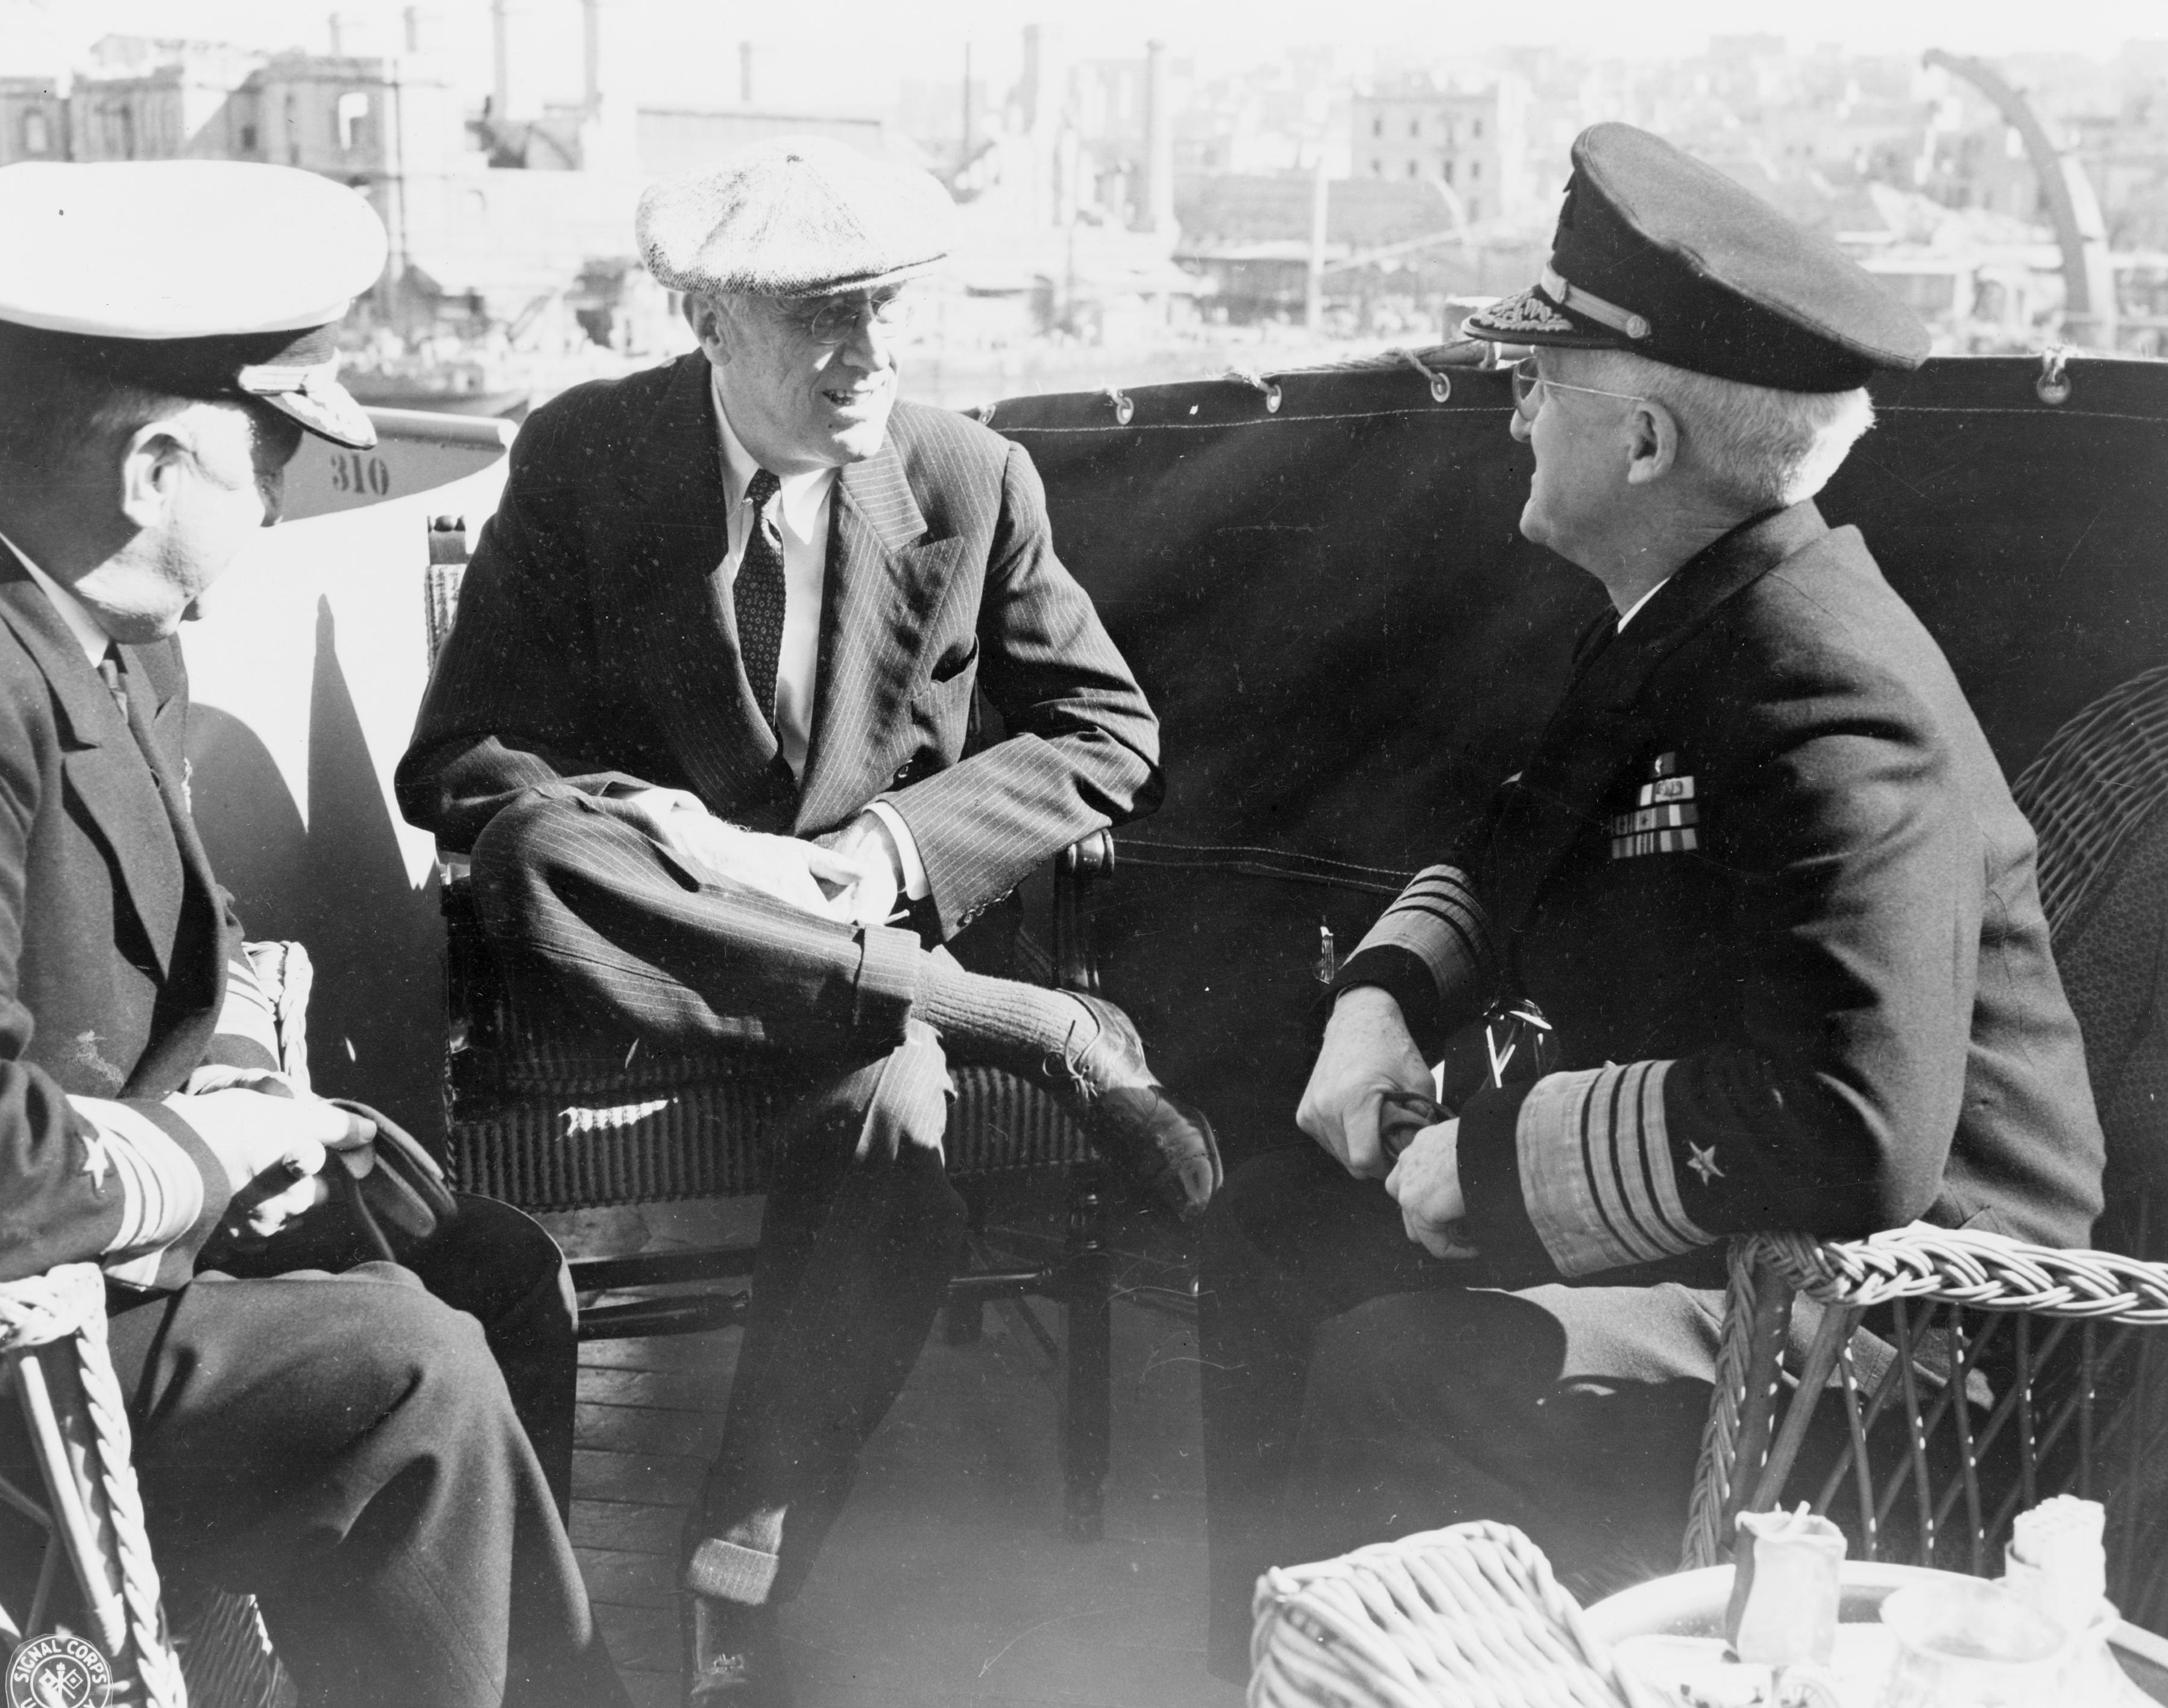 Вице-адмирал Х. Кент Хьюитт, президент Ф.Д.Рузвельт и адмирал Гарольд Р. Старк на борту военного корабля